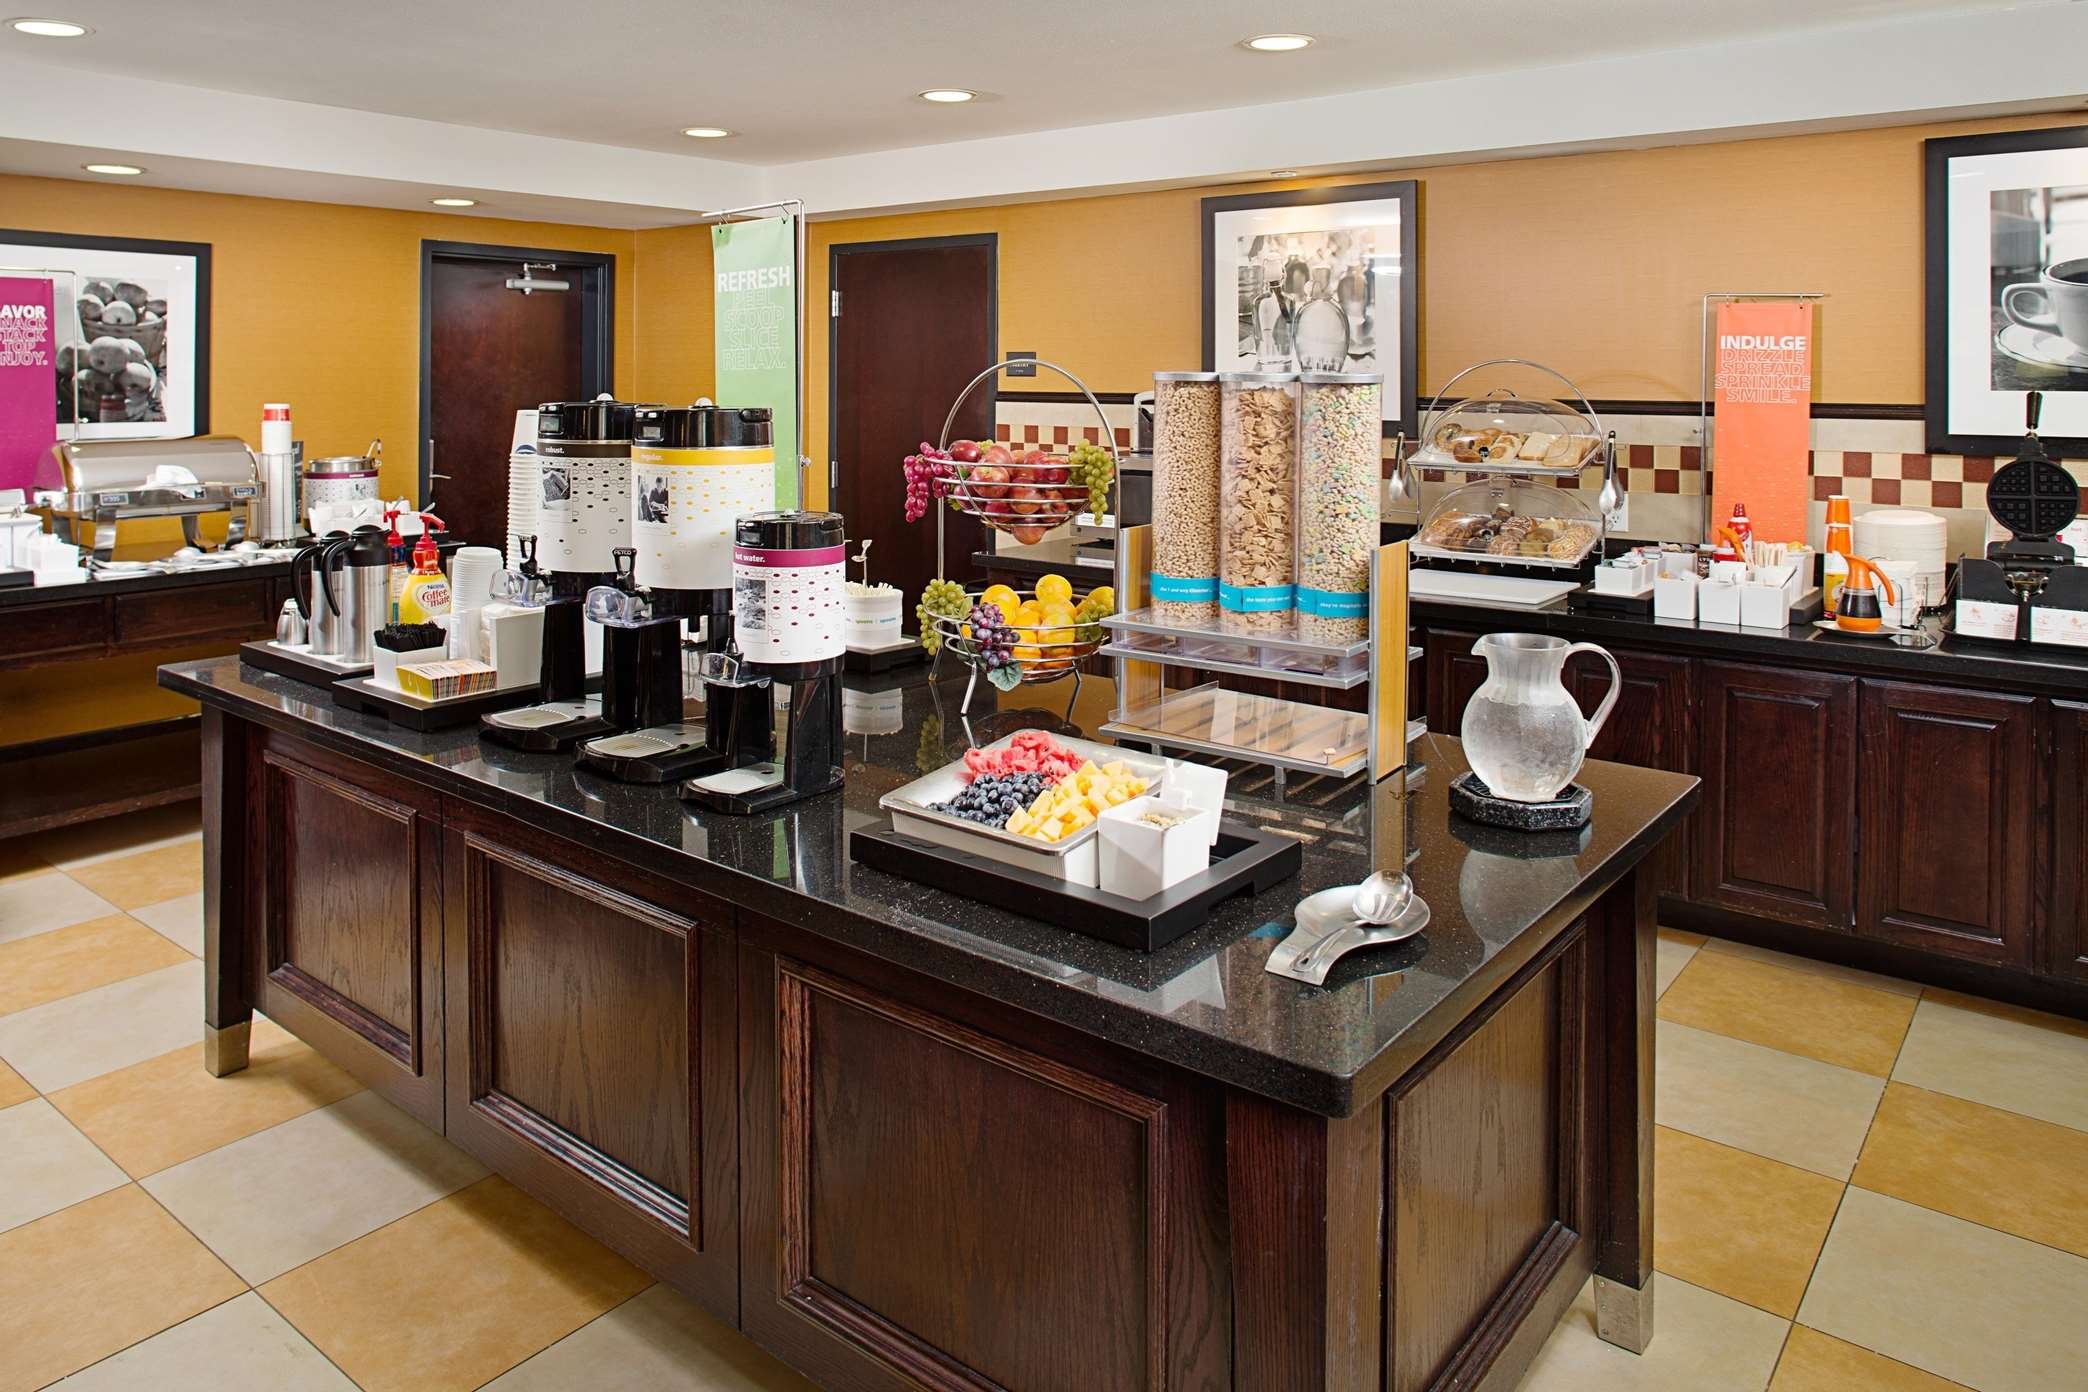 Hampton Inn & Suites Dallas/Lewisville-Vista Ridge Mall, TX image 35